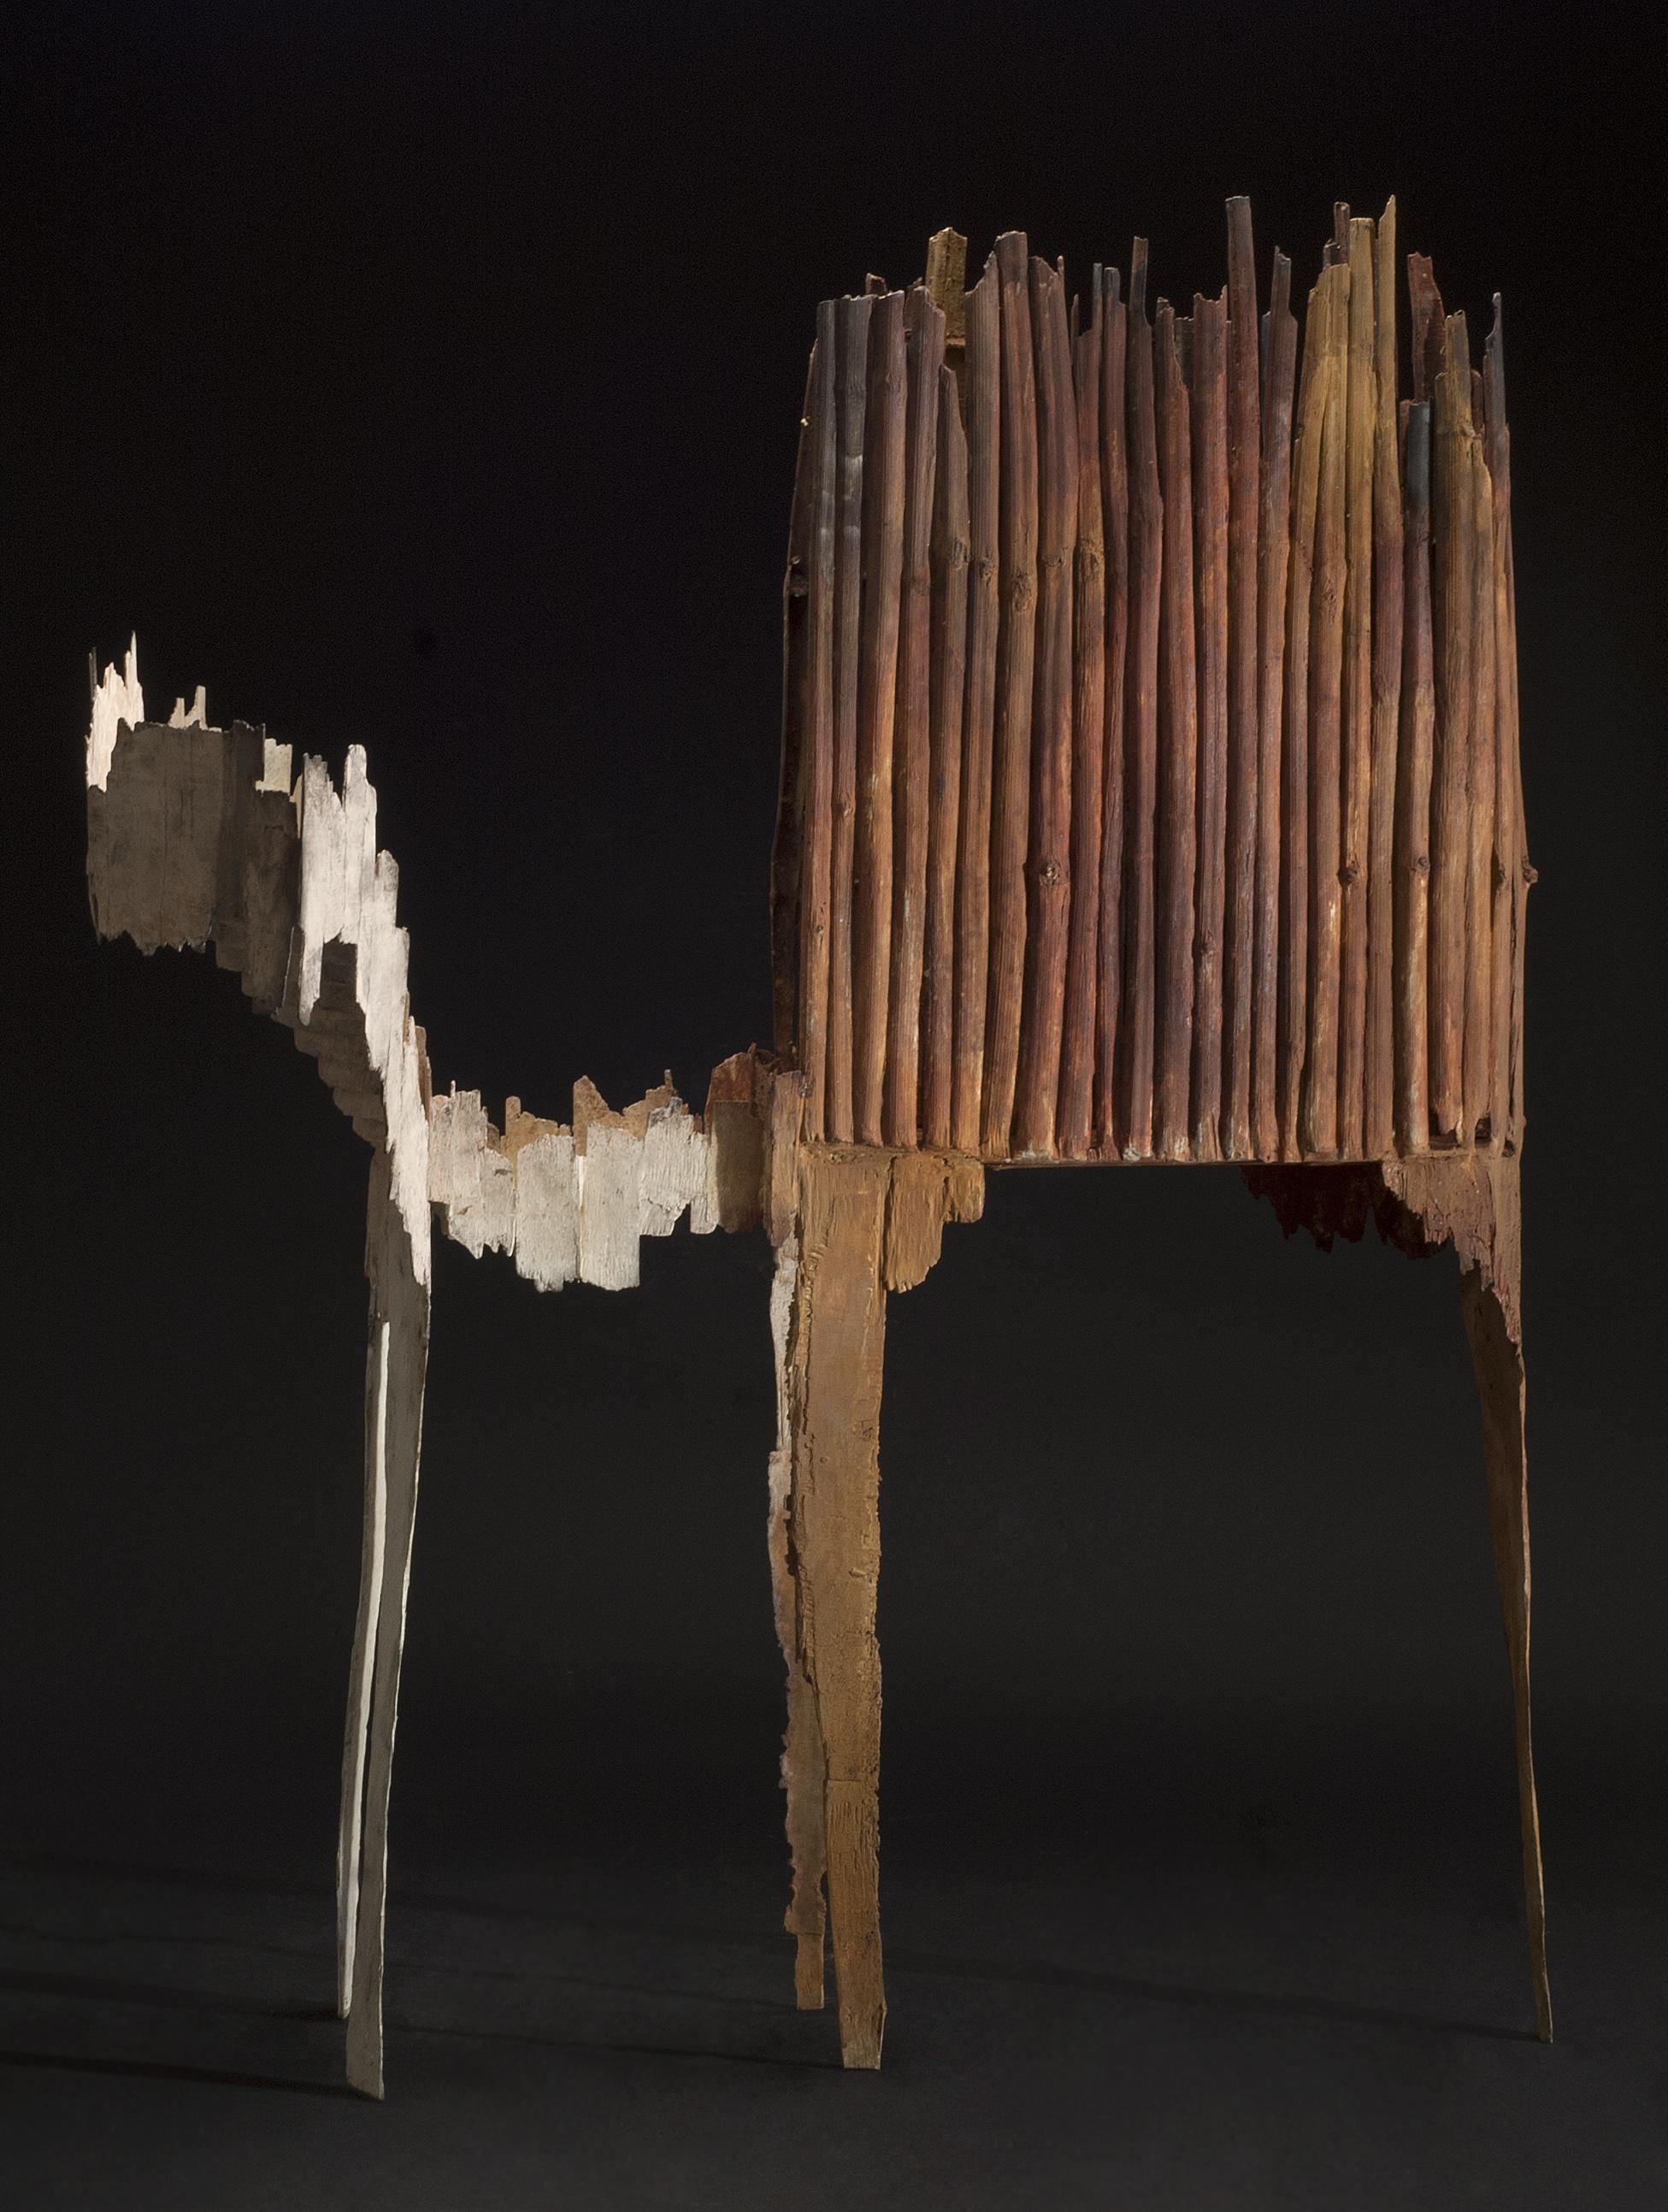 Guillaume Couffignal Théâtre, 2014 Bronze / 41.5 x 32 x 25.5 inches (105.4 x 81.3 x 64.8 cm) / GCo 11